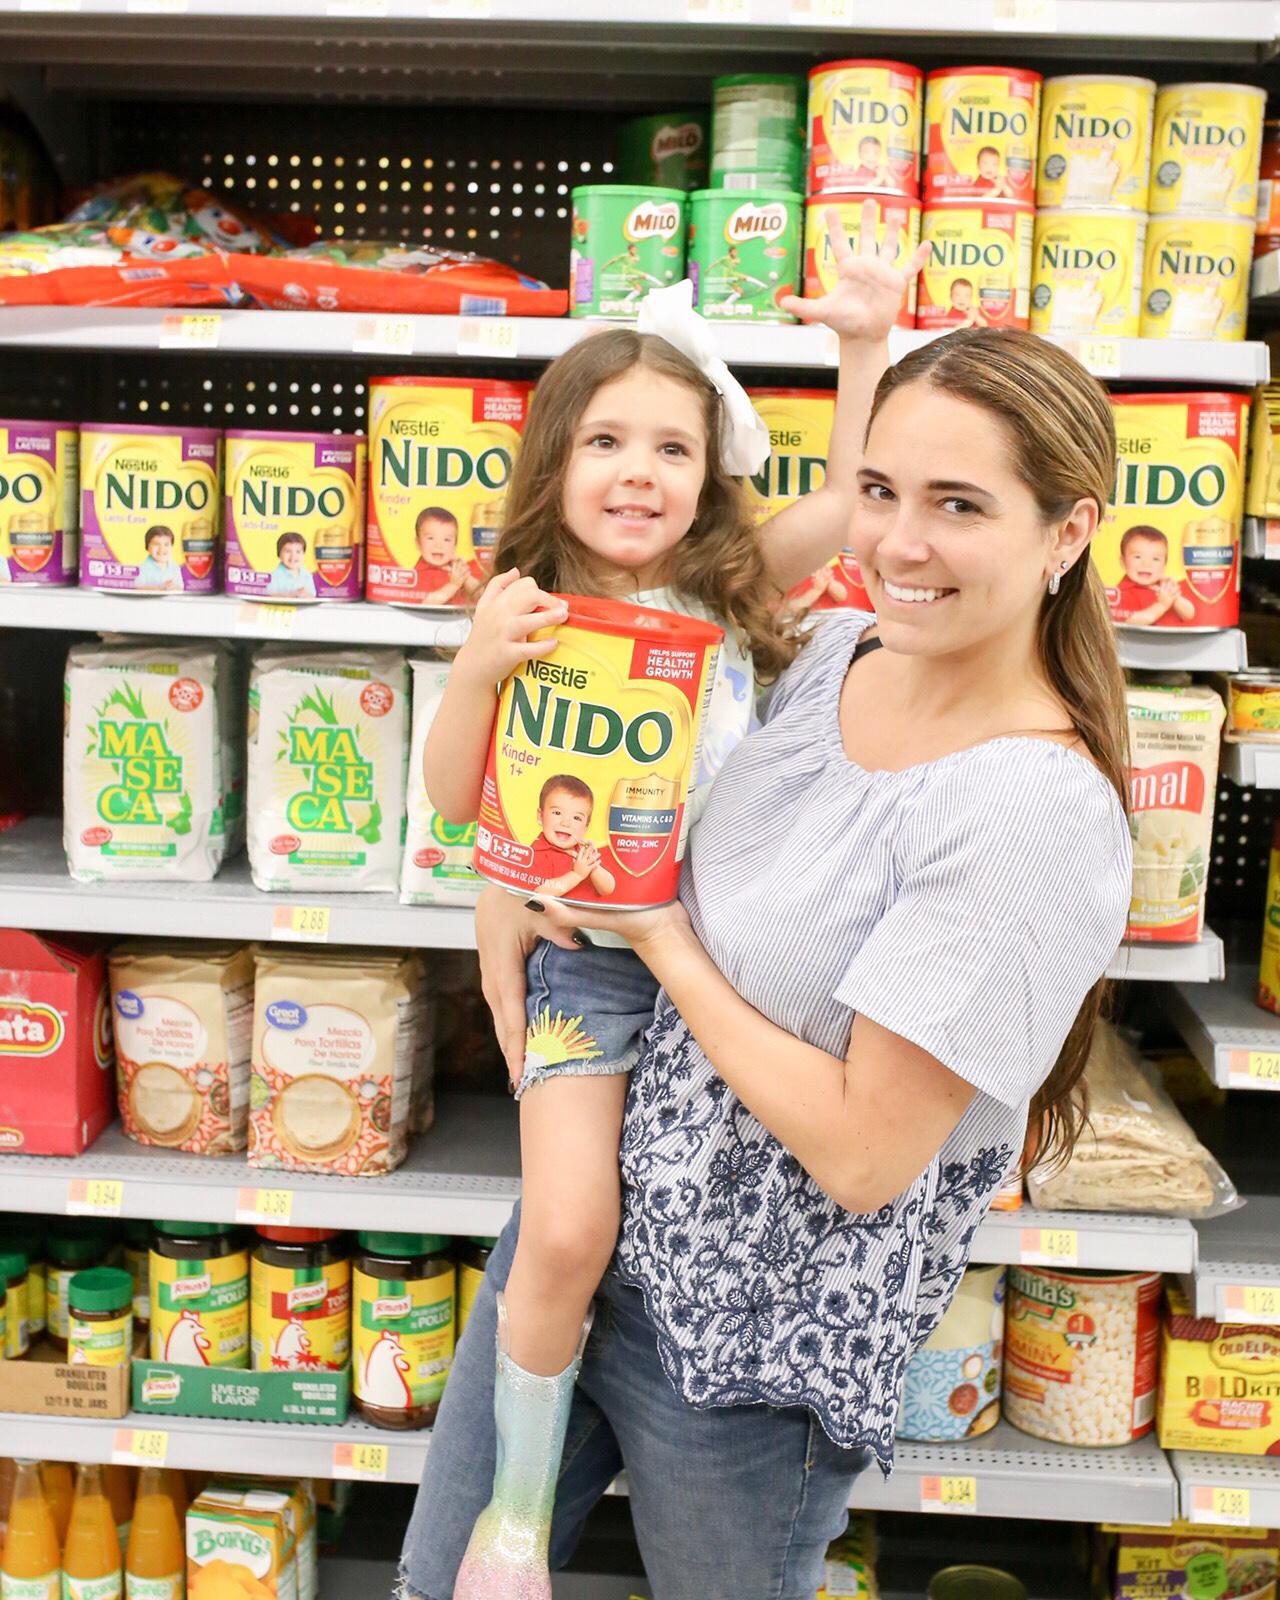 NIDO Kinder – Laura & Co Blog